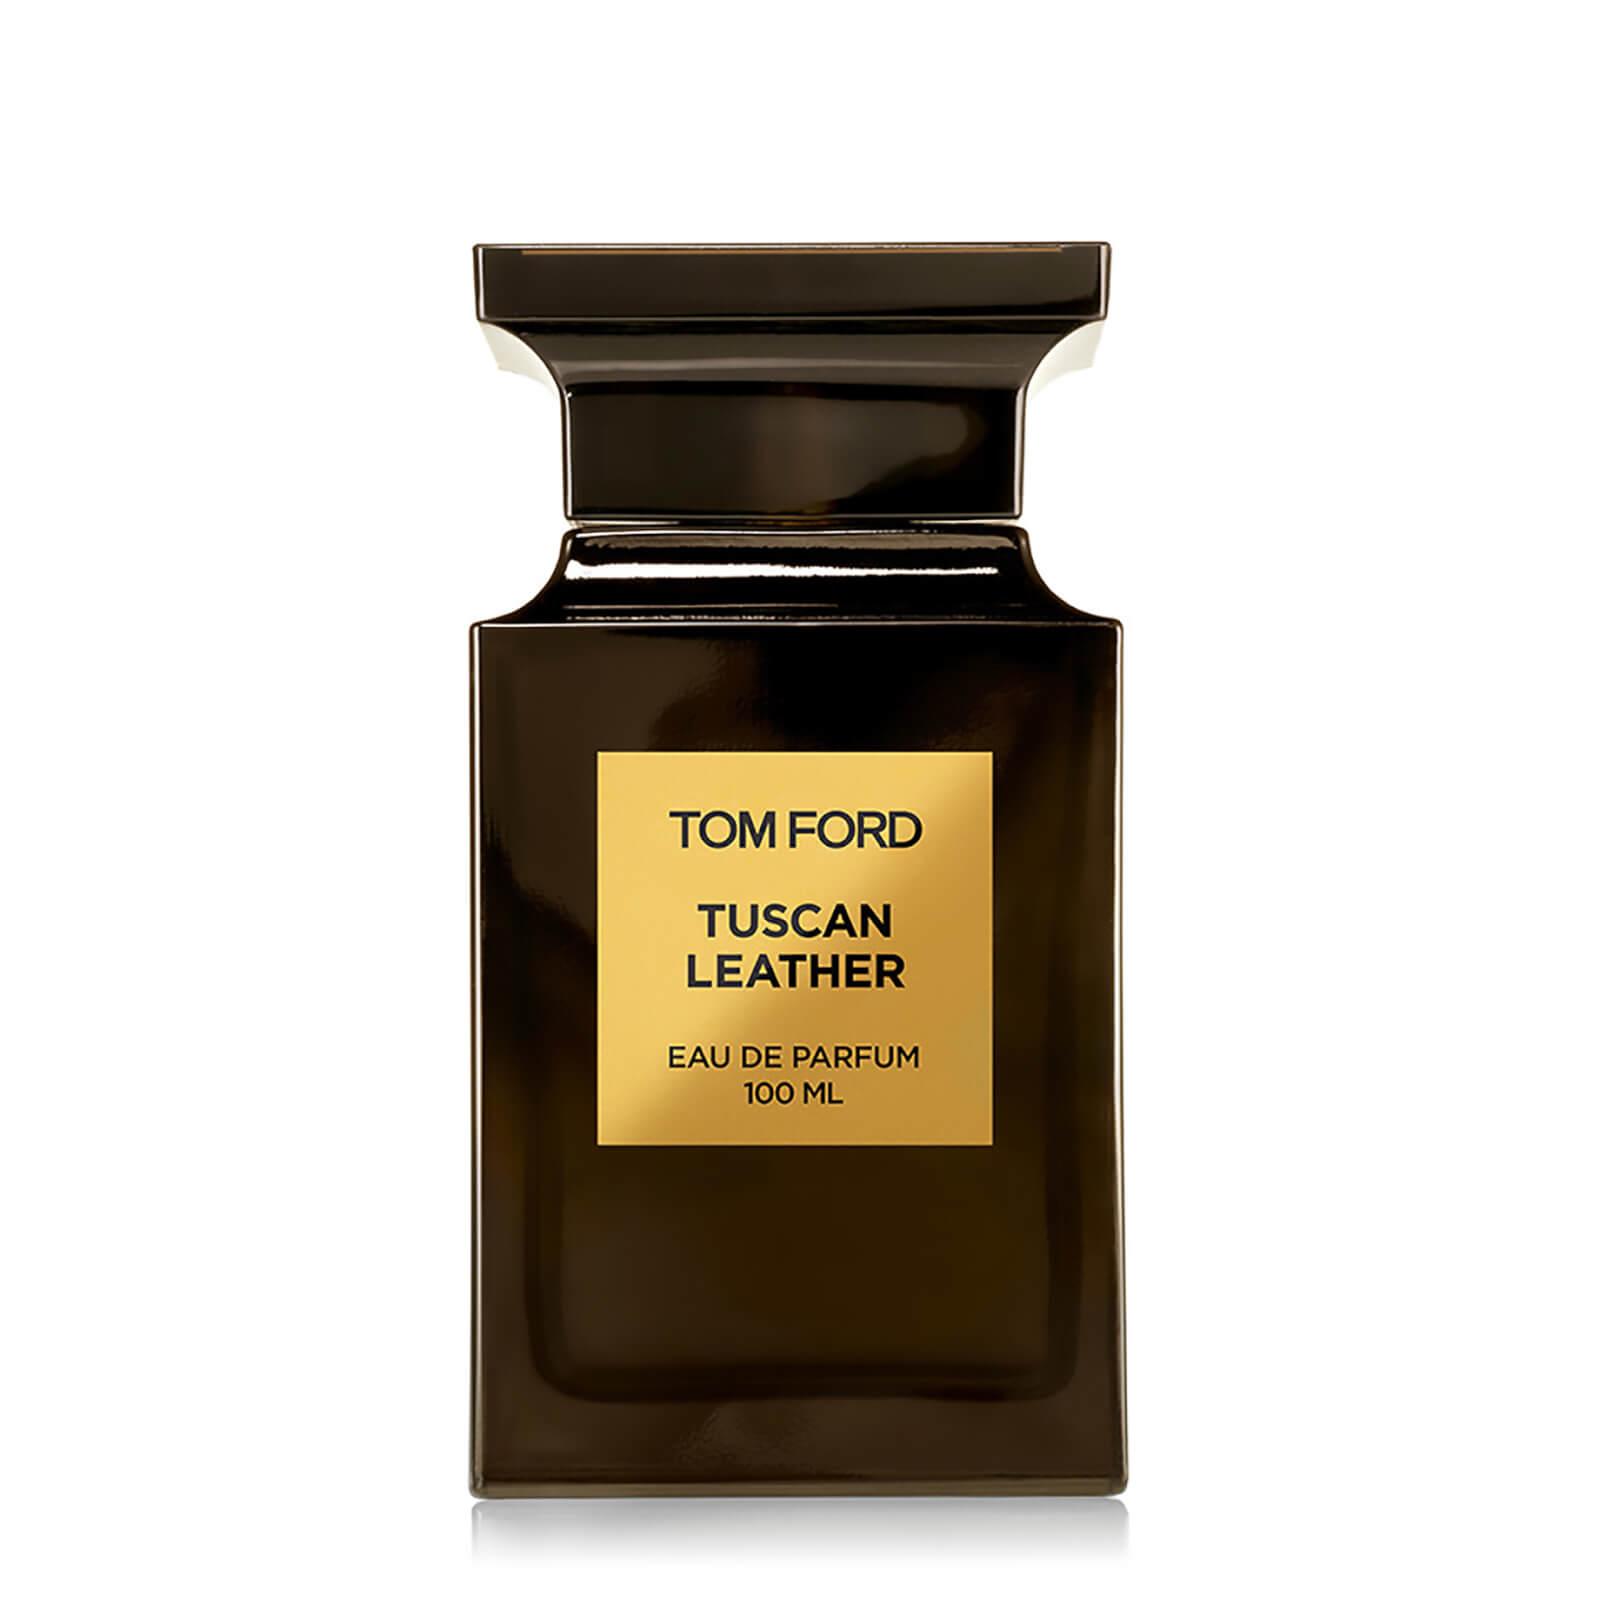 Tom Ford Tuscan Leather Eau de Parfum Spray (Various Sizes) - 100ml